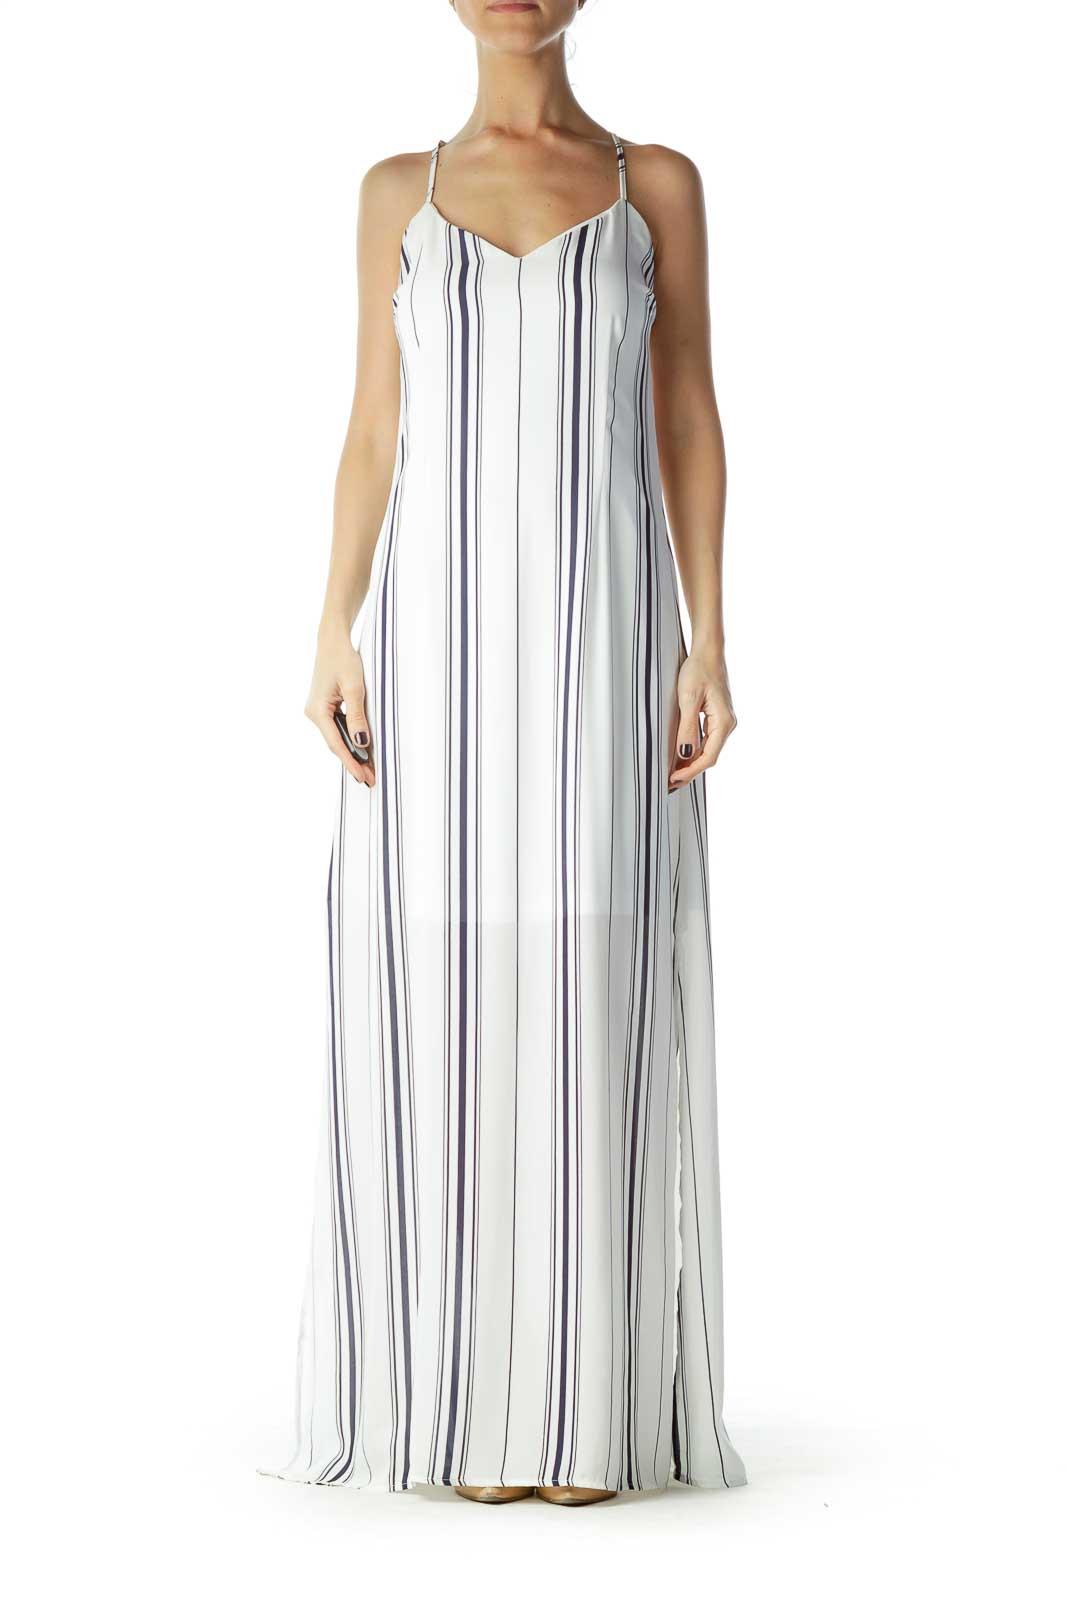 Blue White Striped Spaghetti Strap Maxi Dress